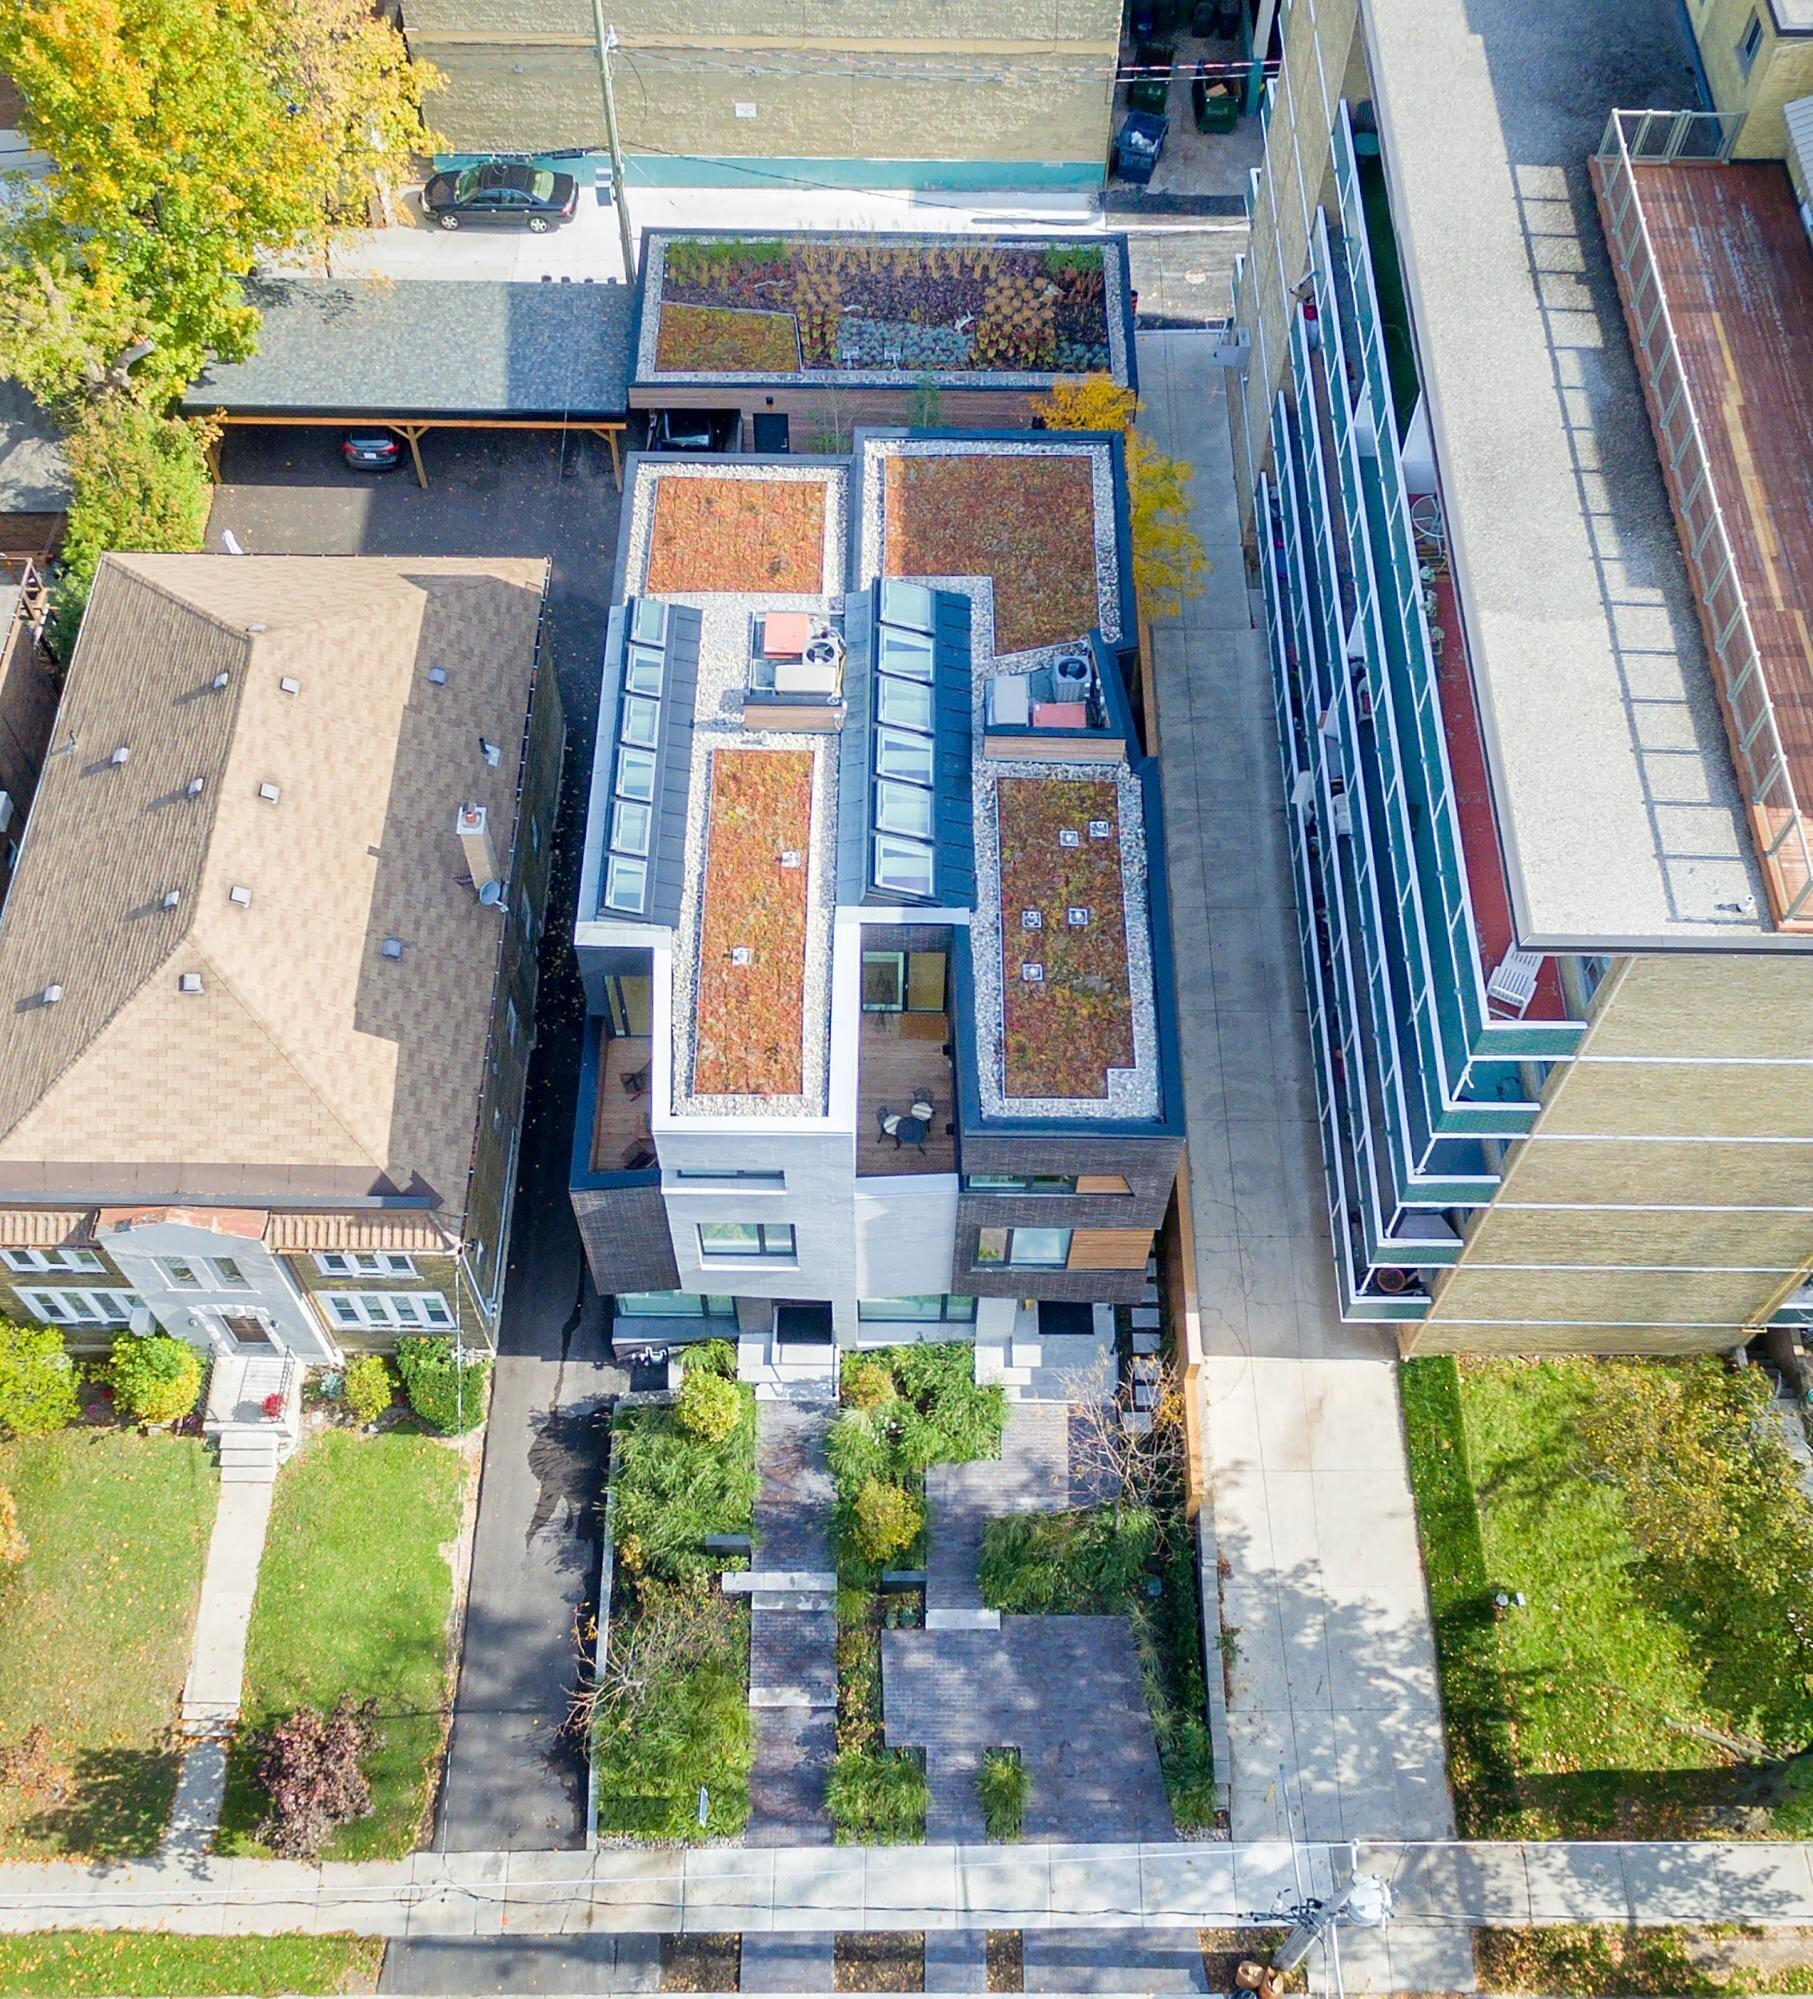 Relmar House是多伦多的一个住宅项目,于2015年完工,利用了多伦多城市生态激励计划。